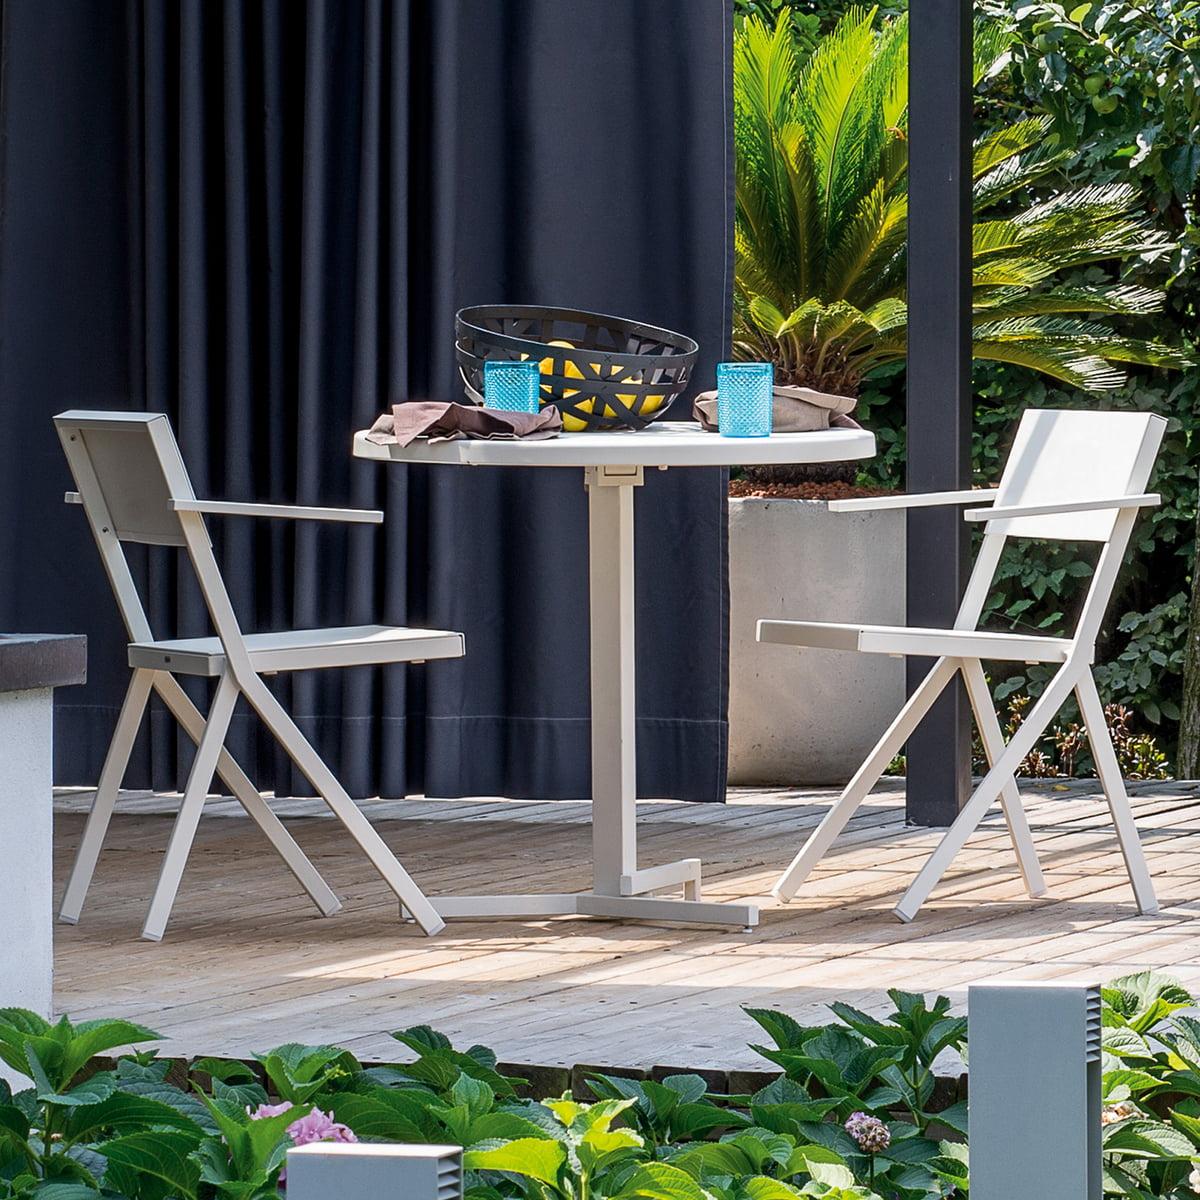 mia armchair by emu connox shop. Black Bedroom Furniture Sets. Home Design Ideas